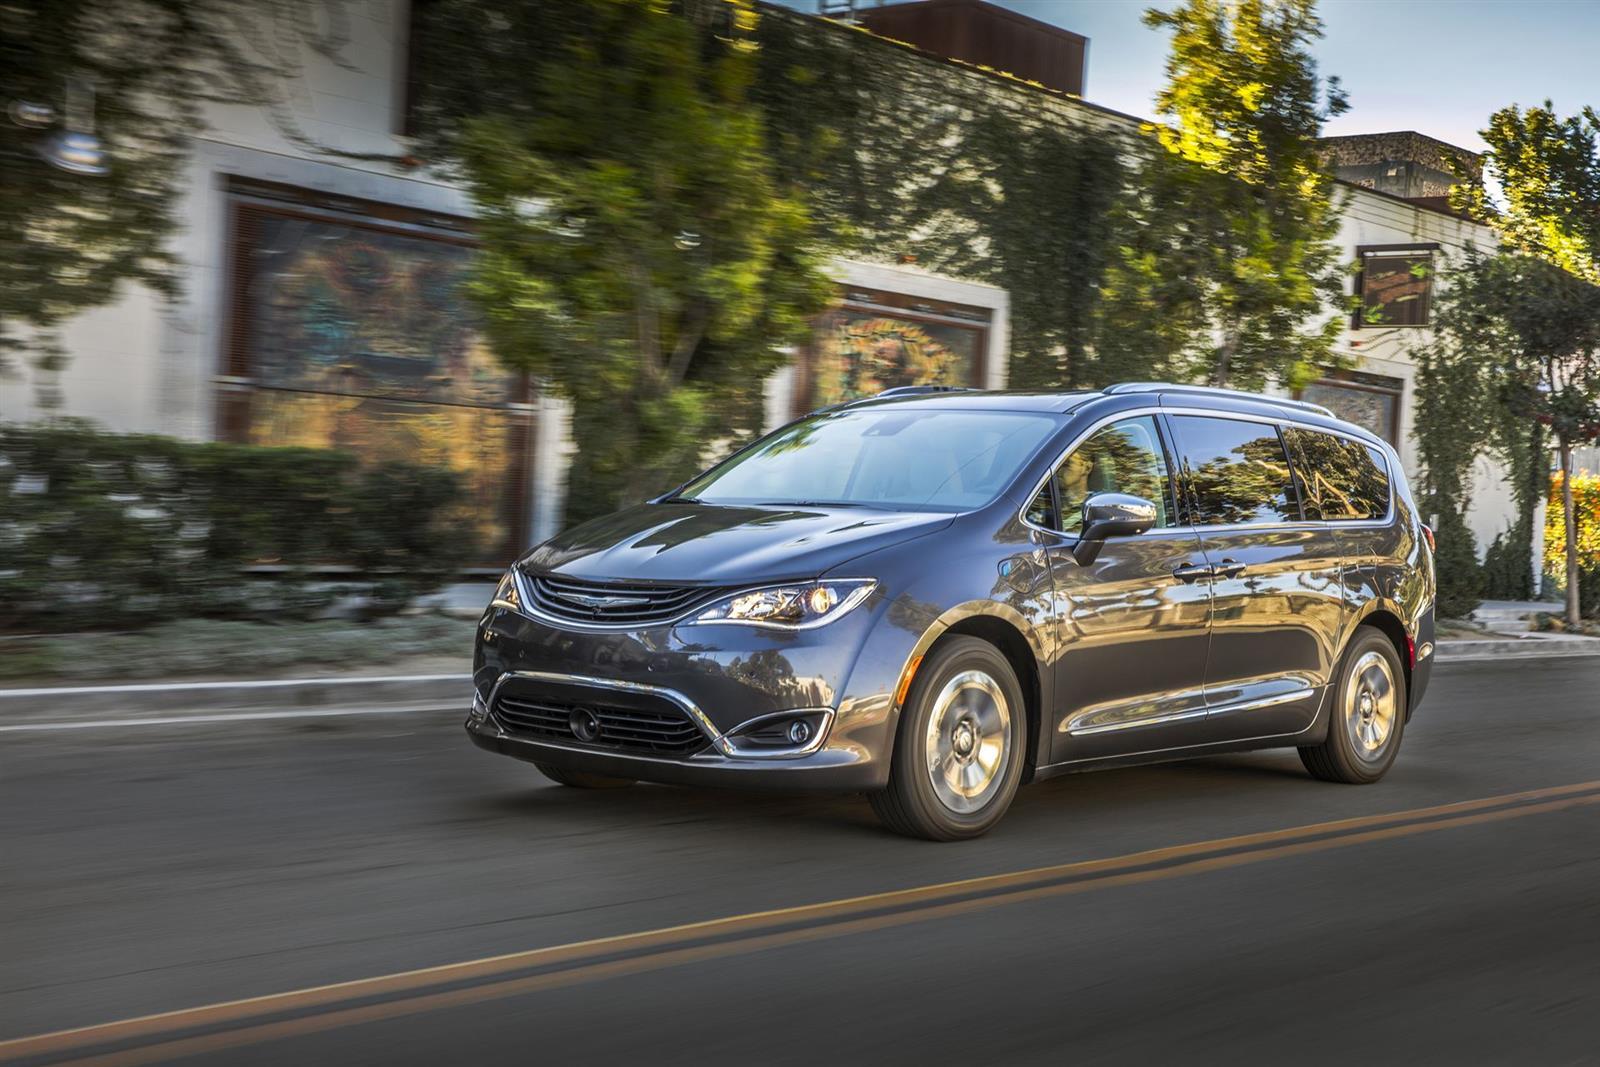 2018 Honda Odyssey Elite Review You Get a Lot of Minivan